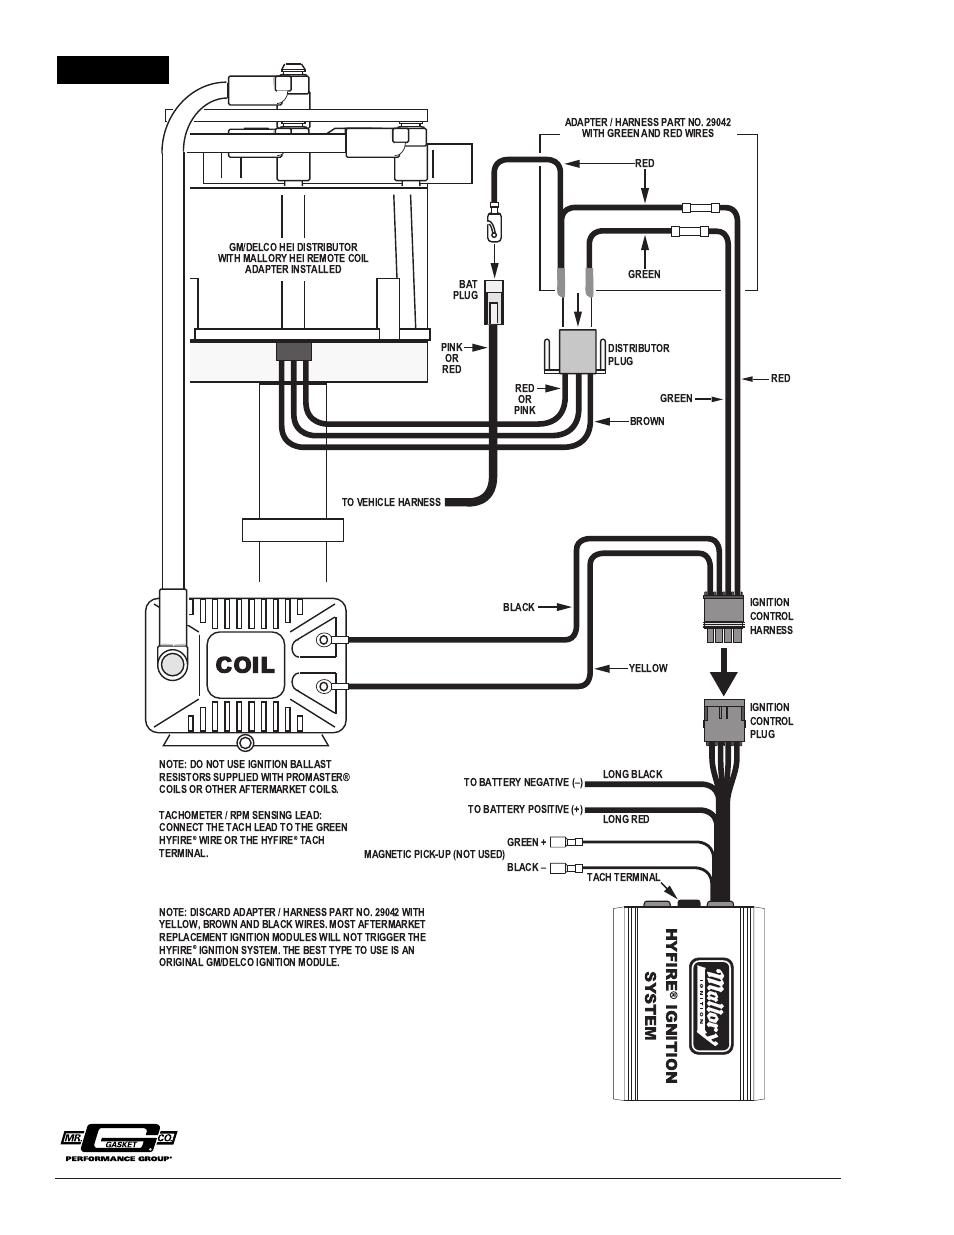 Hei Ignition Wiring Diagram Sbc Hei Wiring Diagram Chevy Spark – Distributor Ignition Wiring Diagram